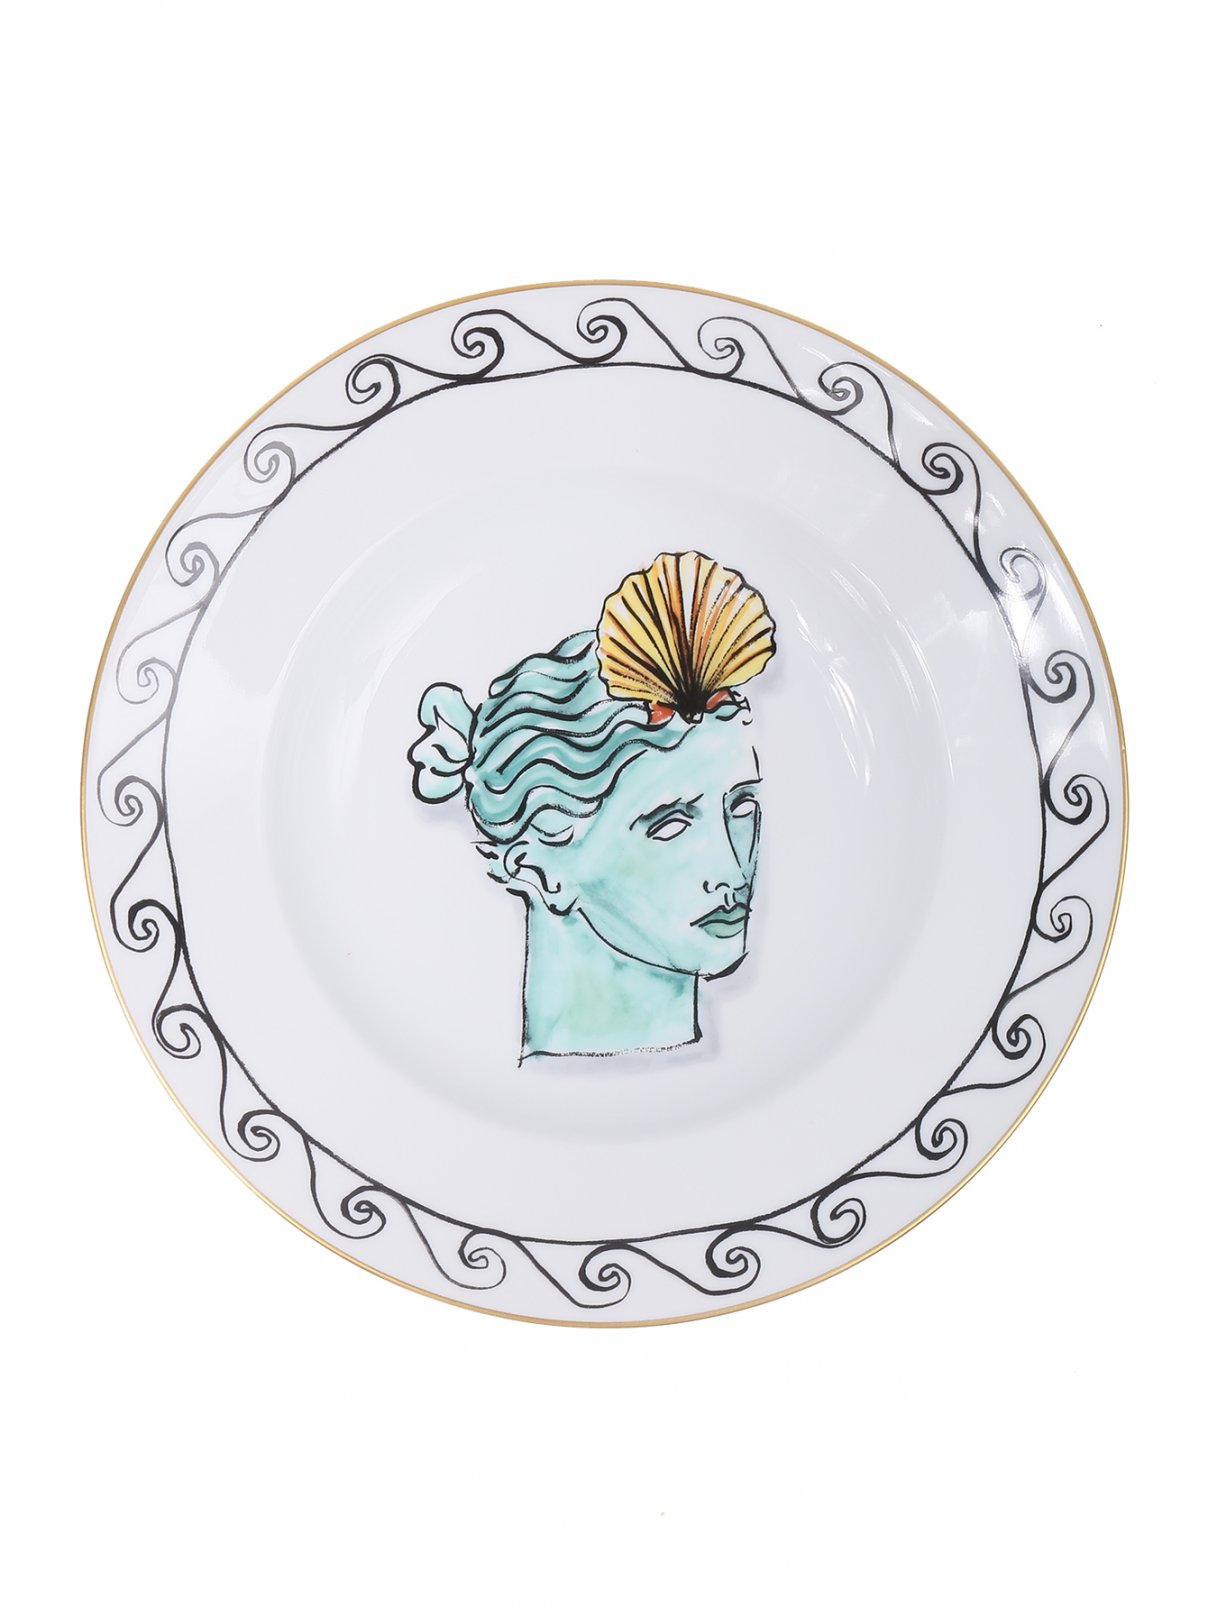 Тарелка суповая с орнаметом и узором Richard Ginori 1735  –  Общий вид